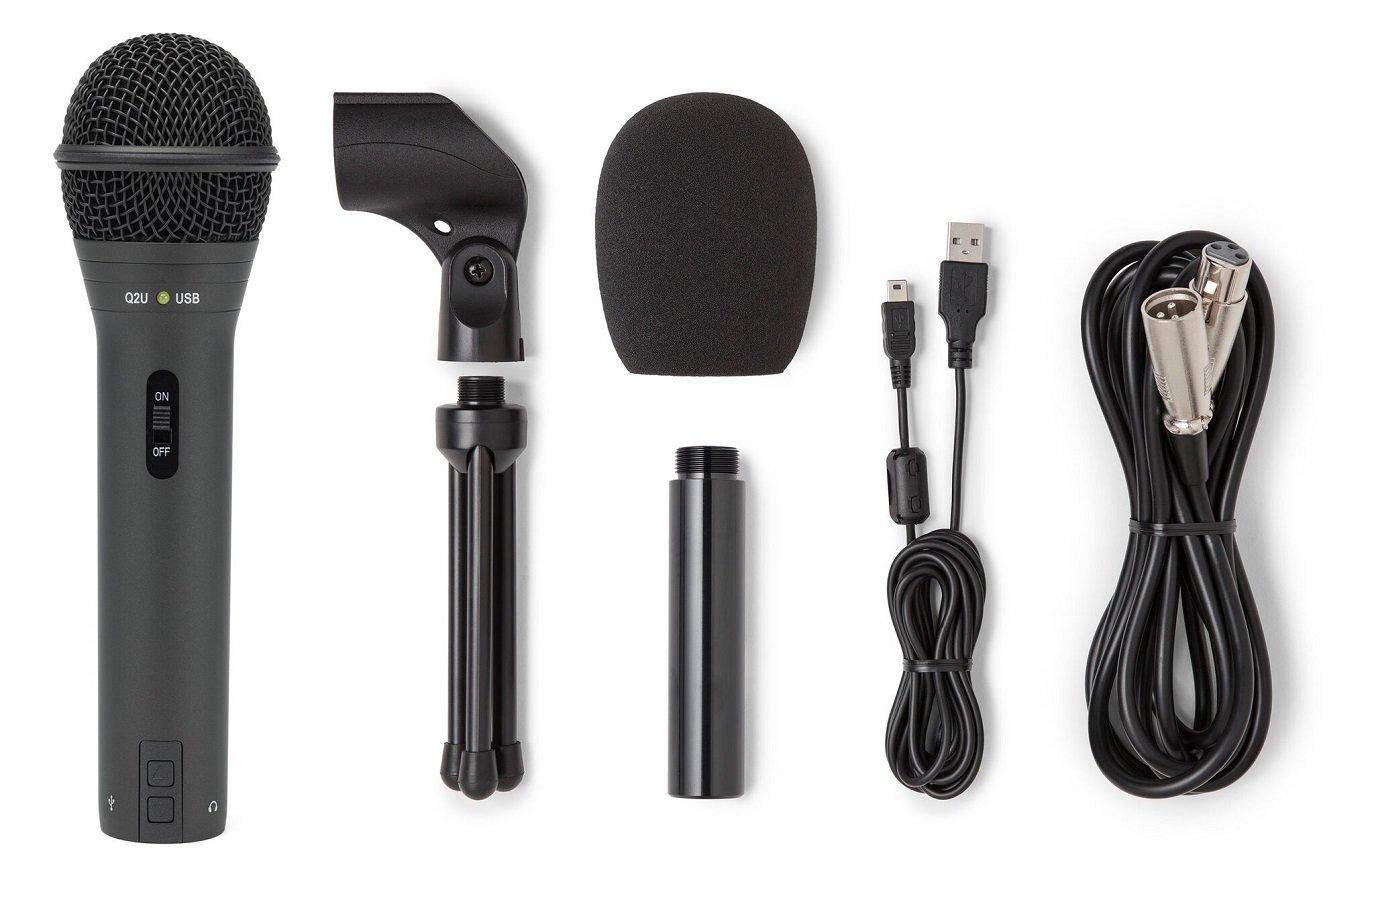 Best Dynamic Microphones For Podcasting : samson q2u handheld dynamic usb microphone recording and podcasting pack techadict ~ Vivirlamusica.com Haus und Dekorationen